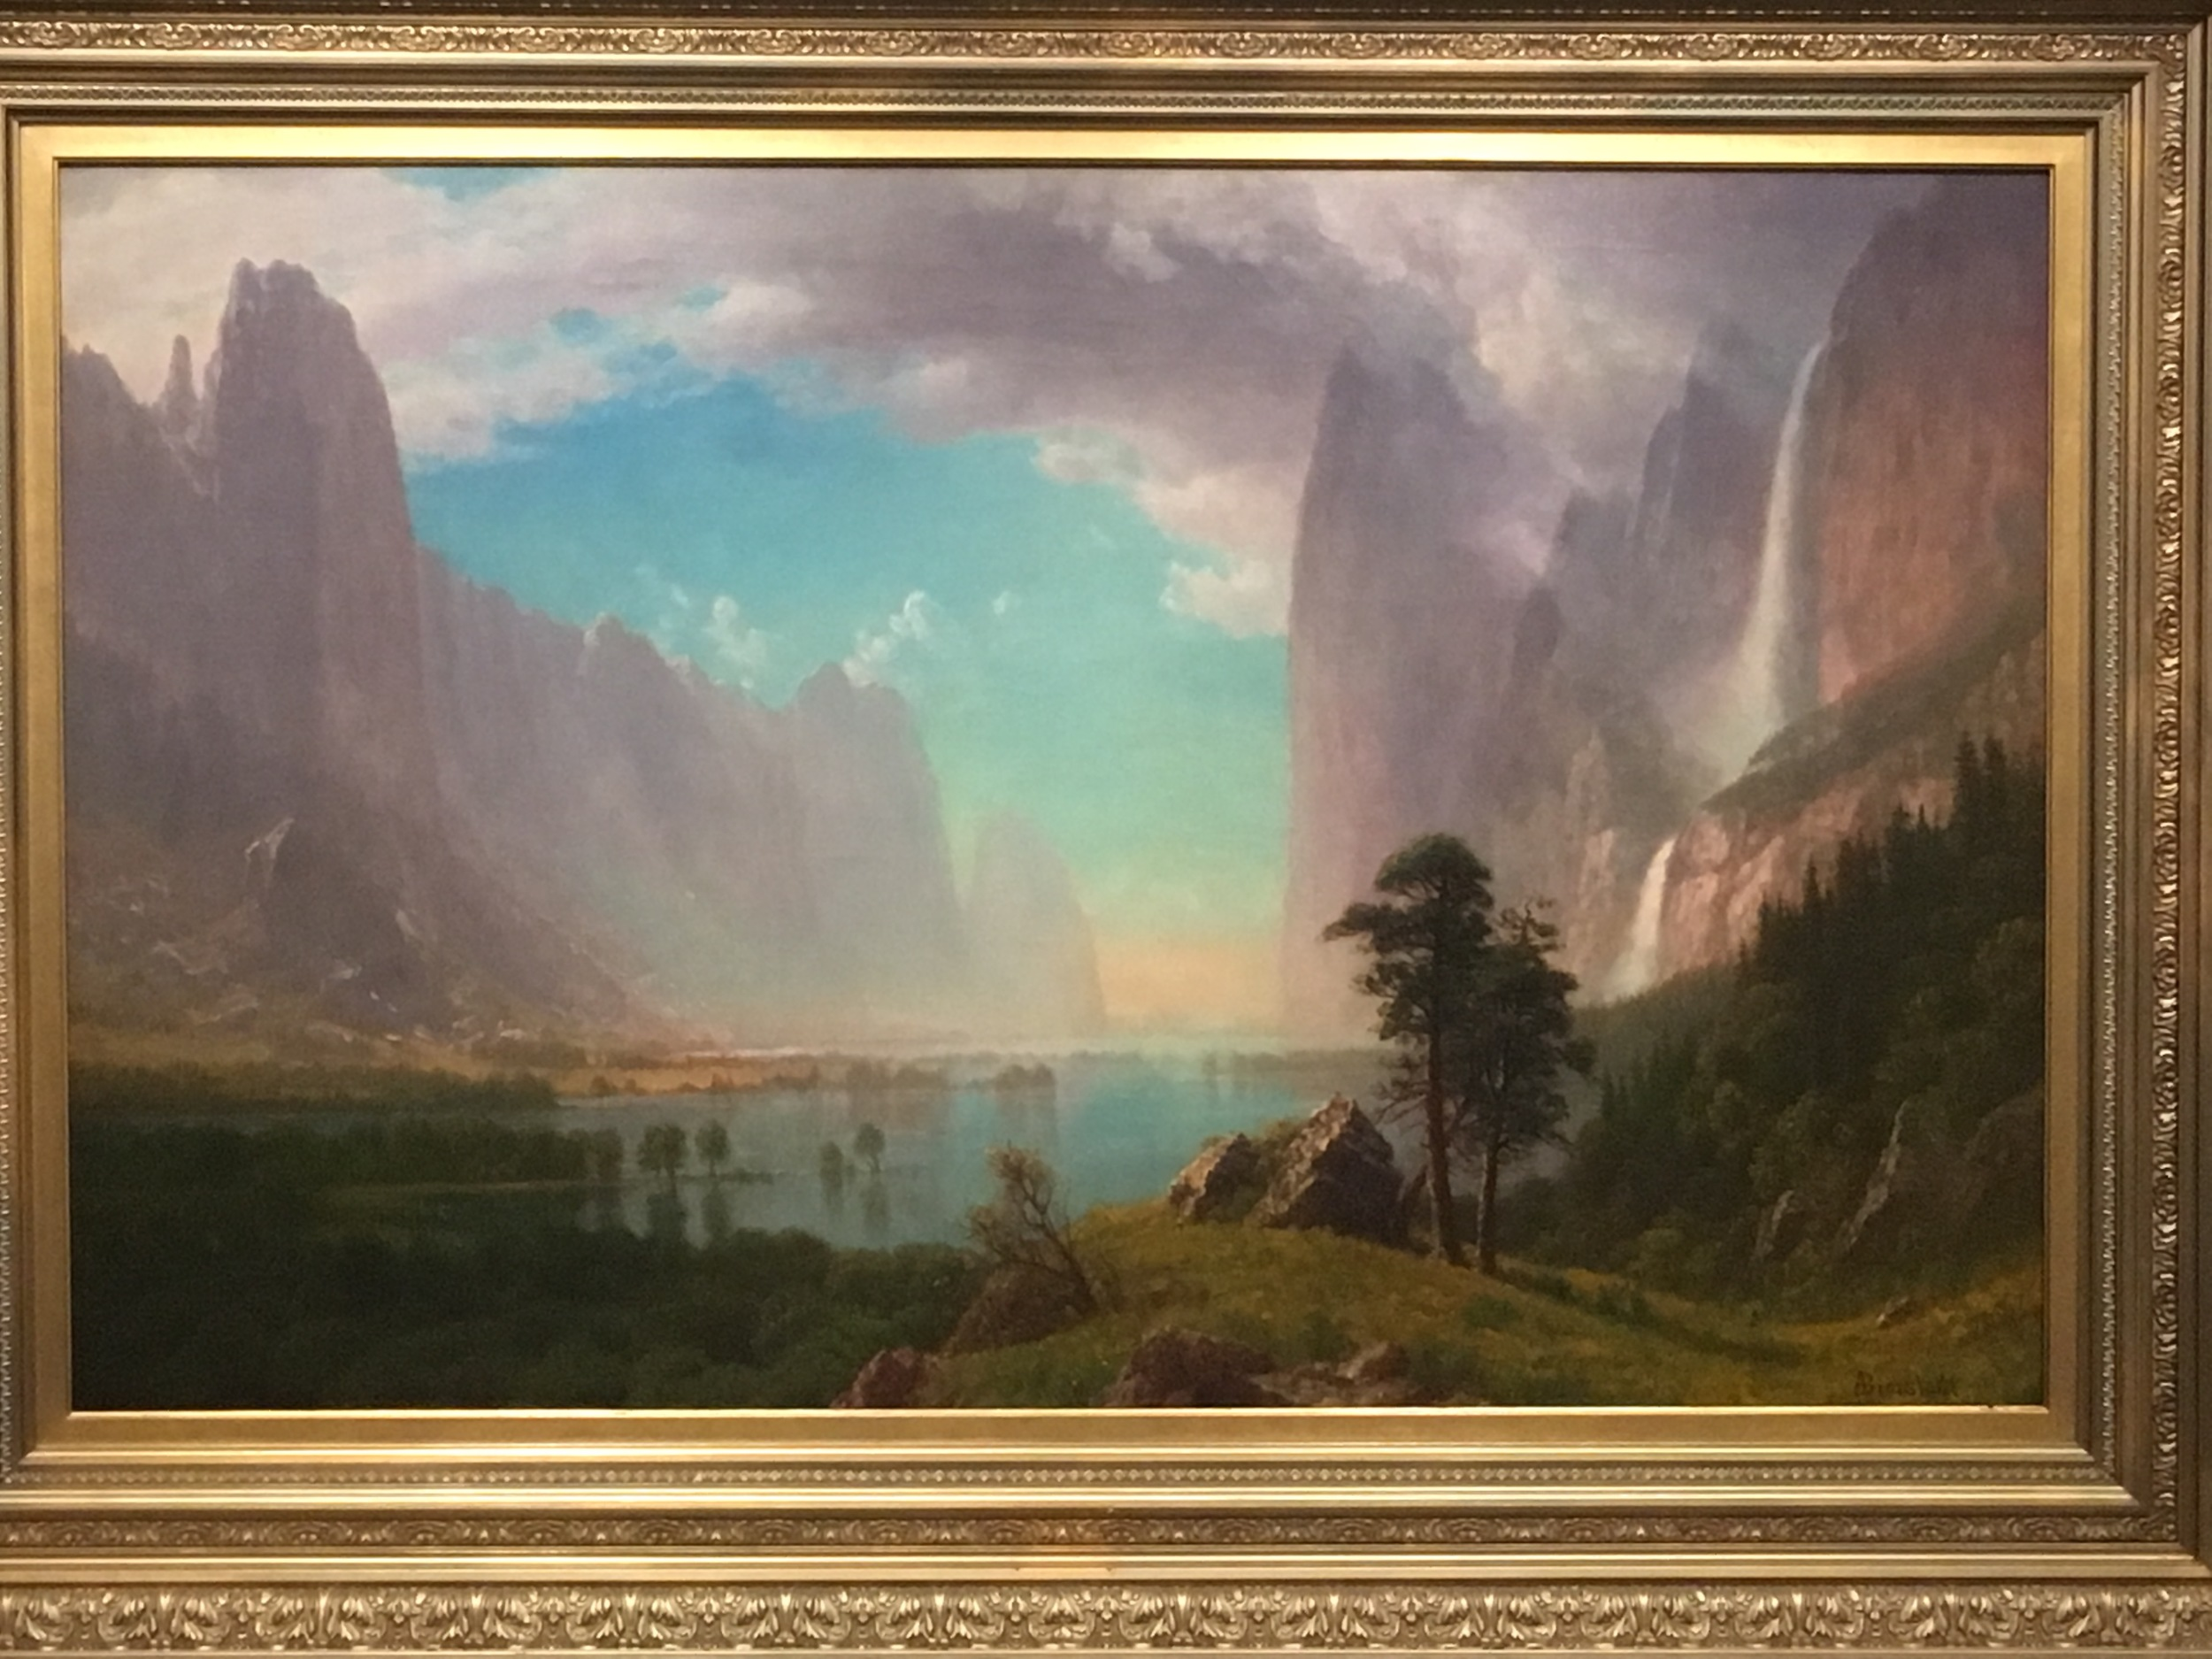 Yosemite, appx. 1870